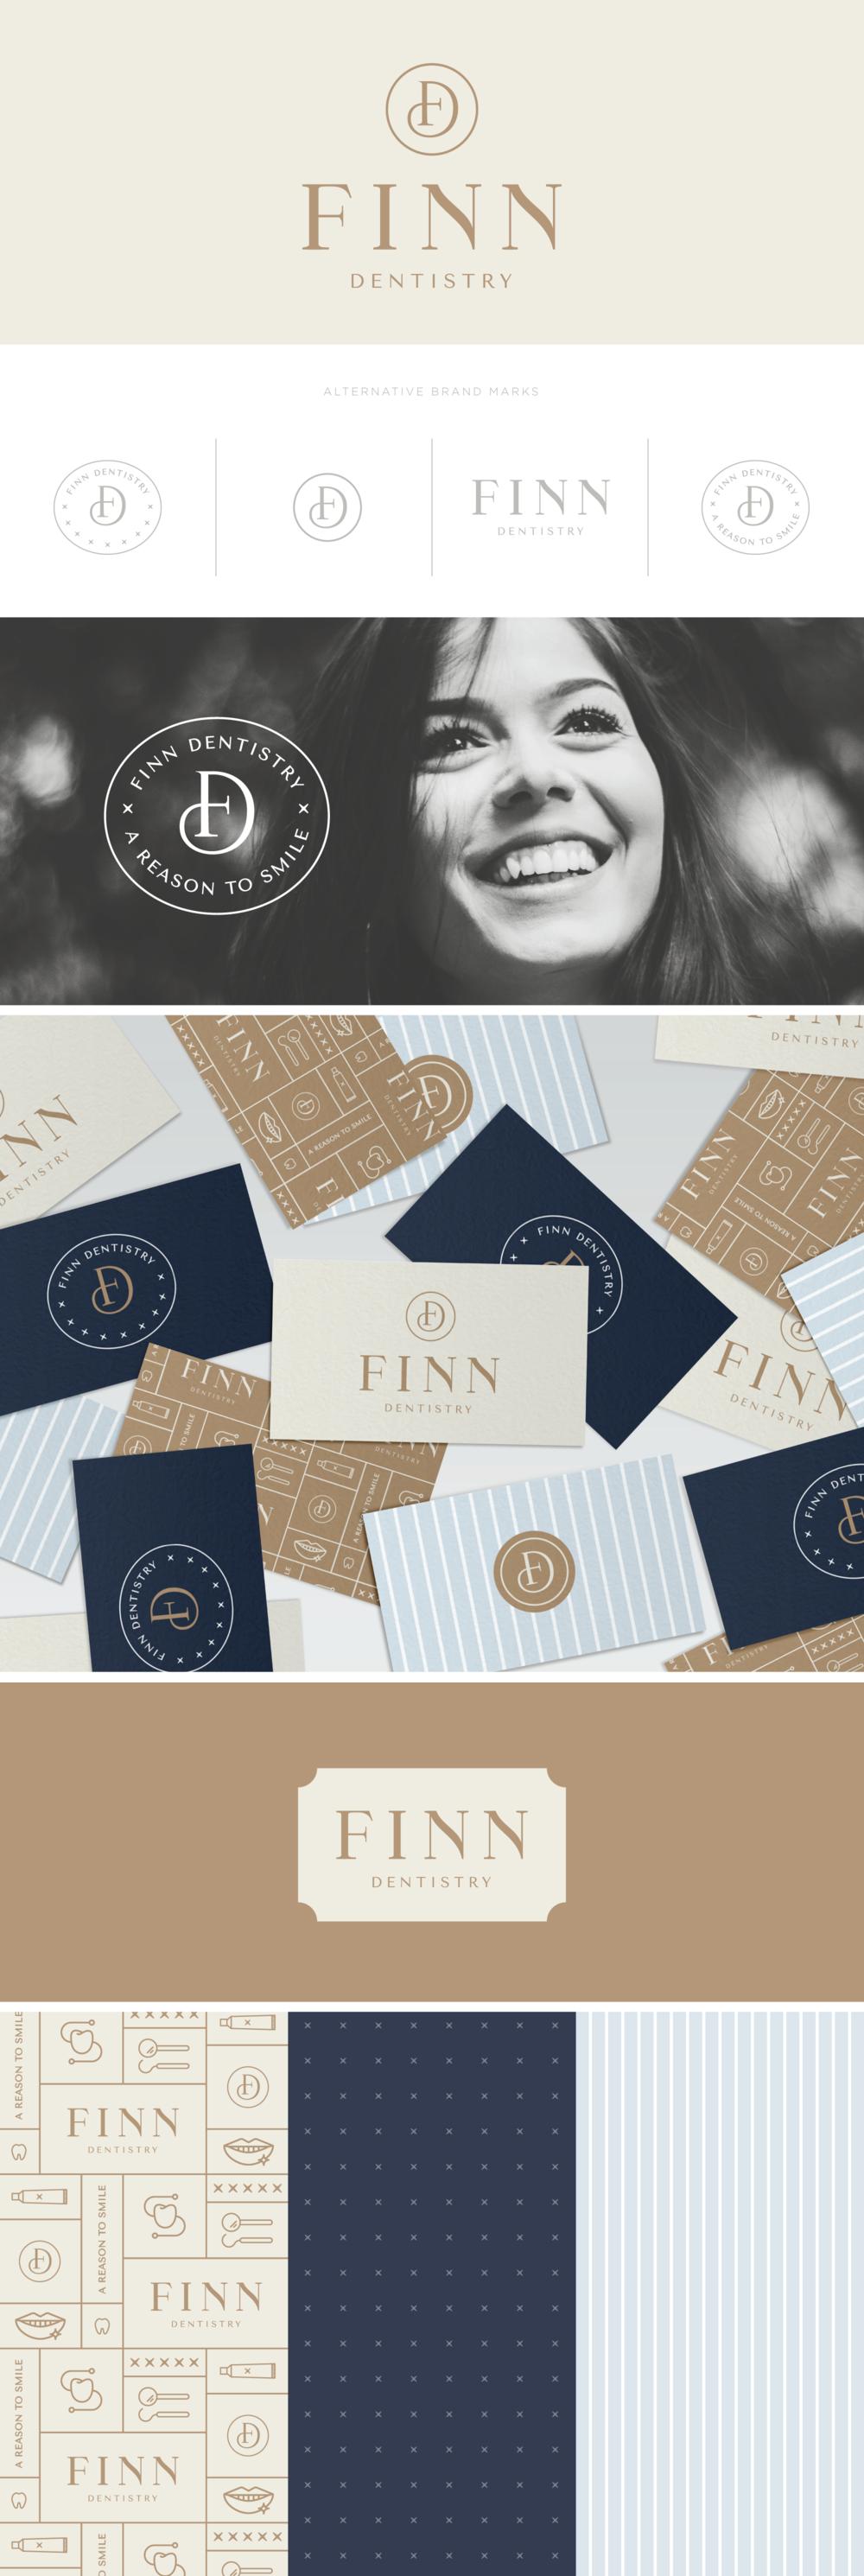 Finn Dentistry Brand Design   Pace Creative Design Studio